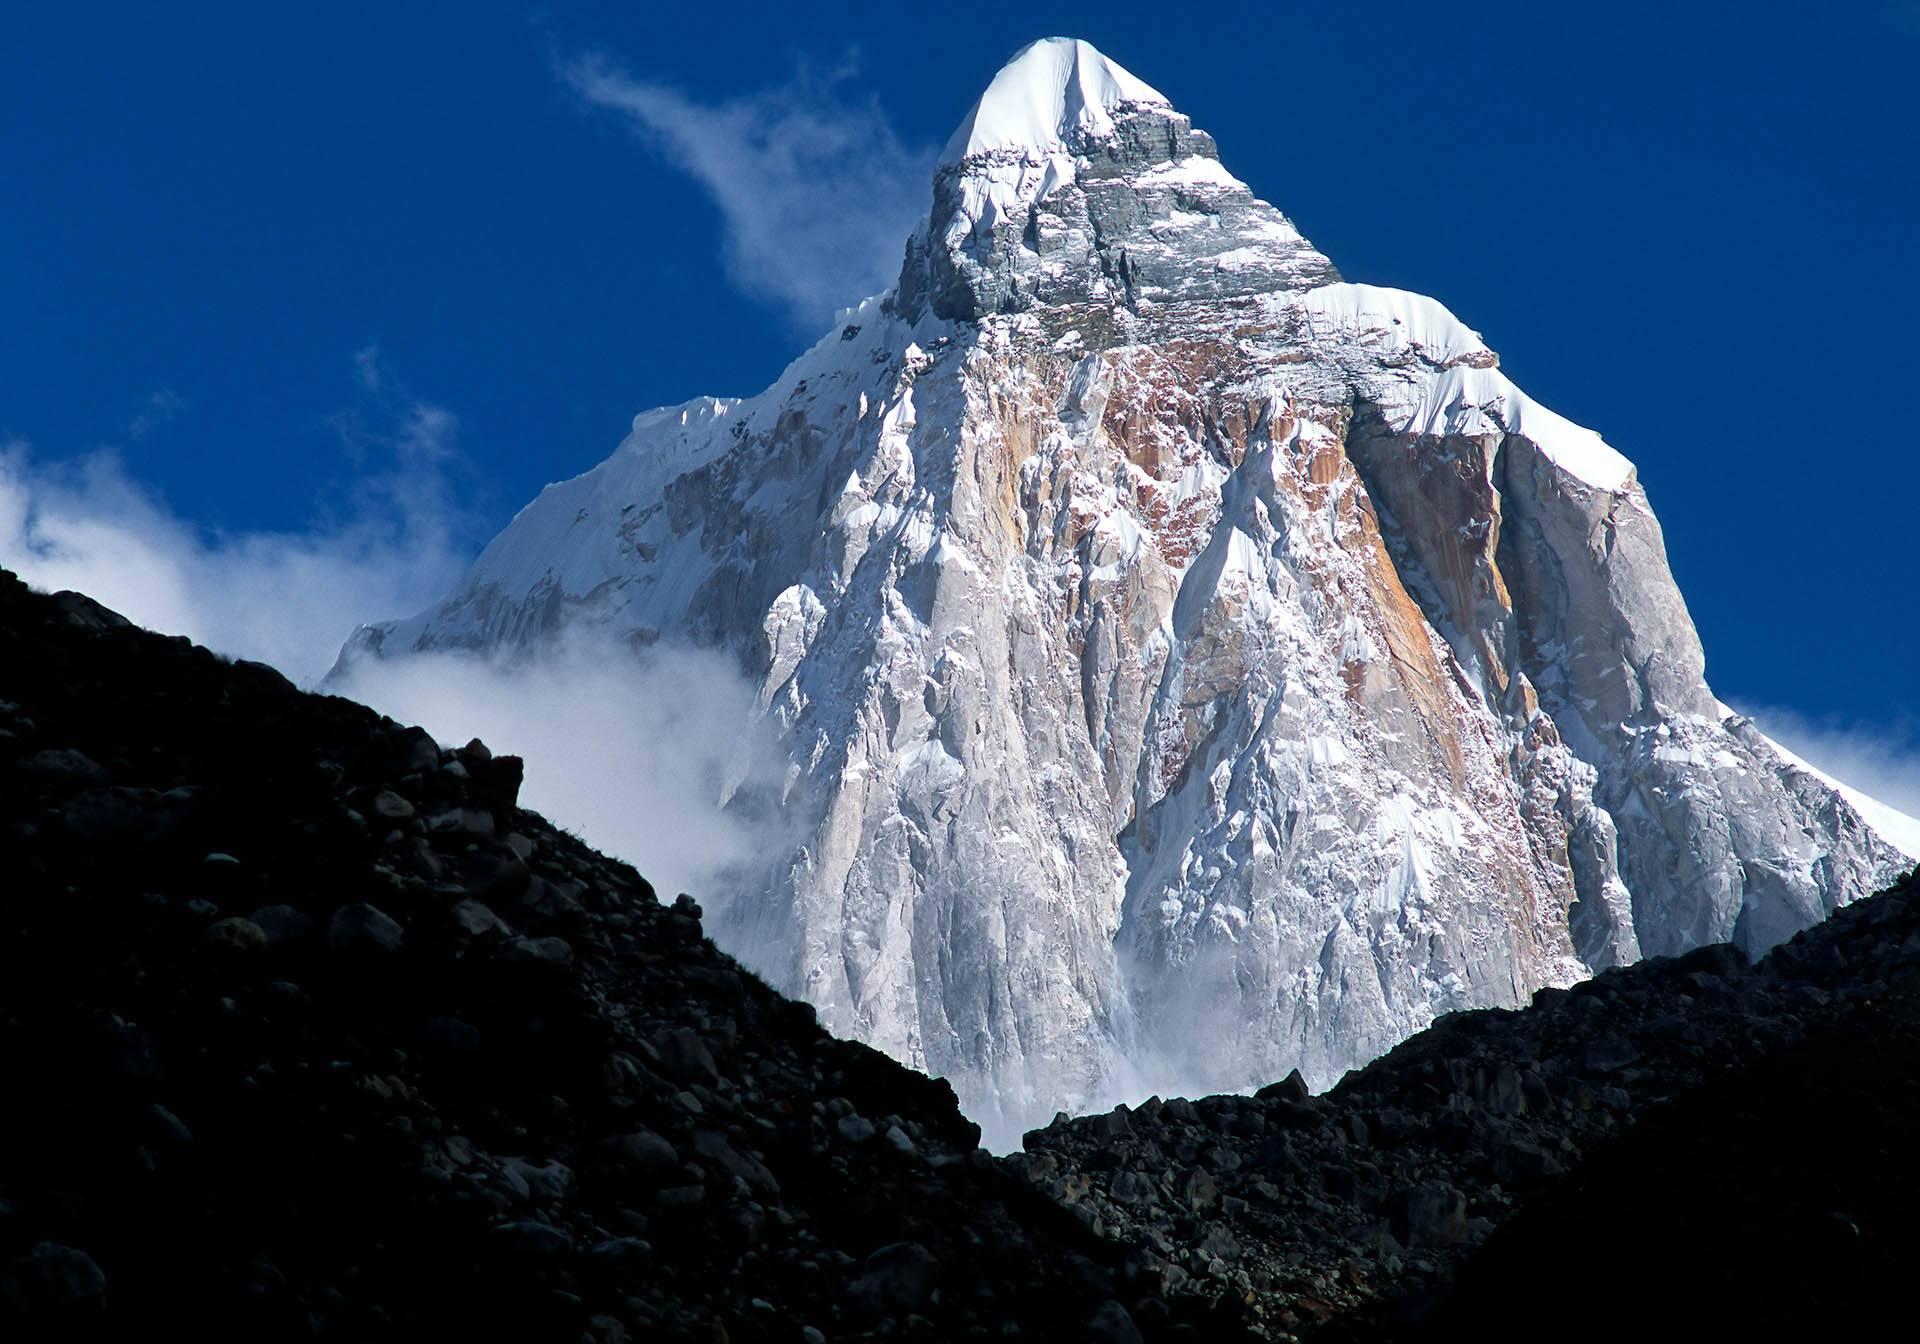 ©Melvin Redeker bergbeklimmer - Onbereikbare liefde